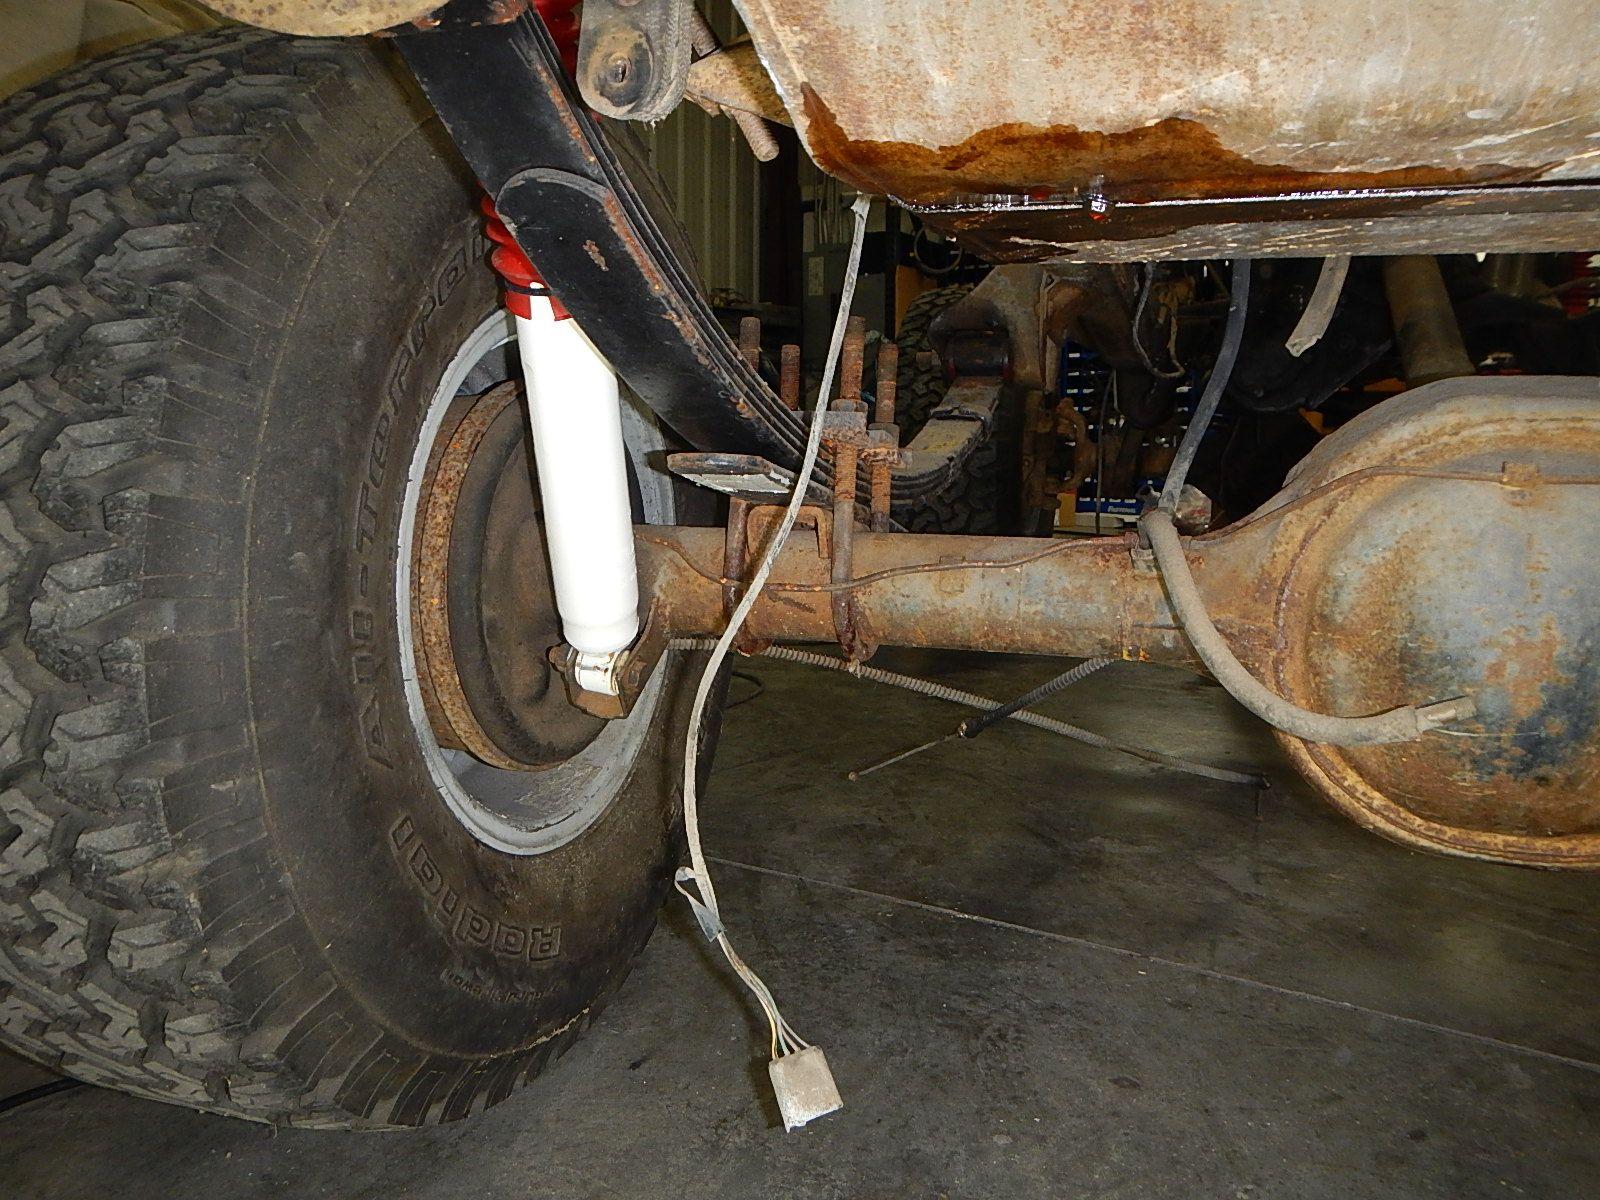 1972 Bronco restoration dis assembly 053.jpg